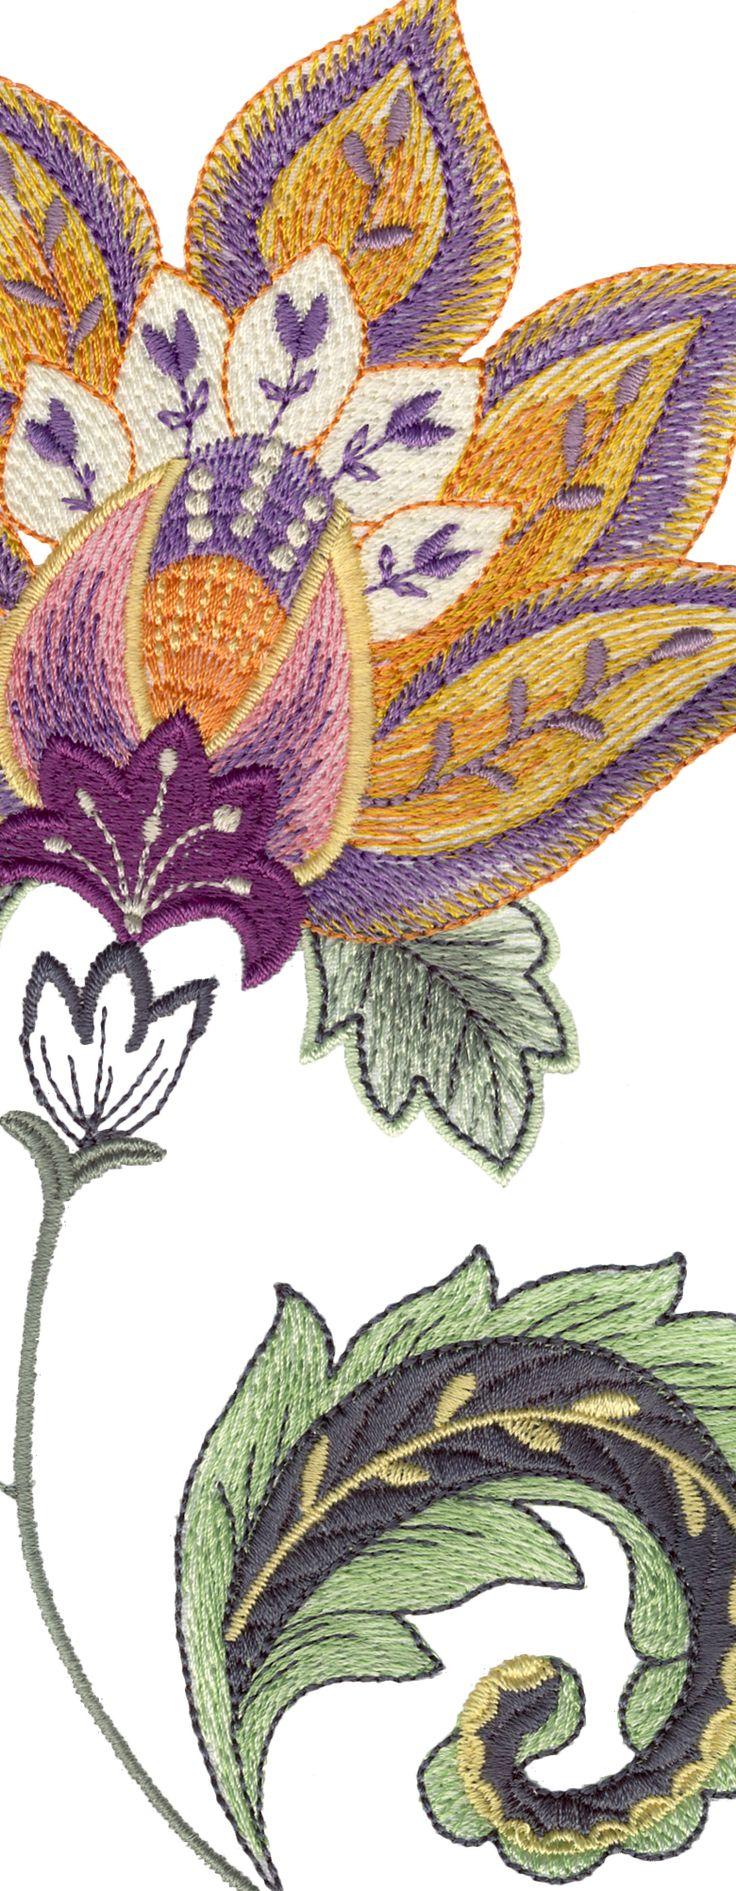 Jacobean Visions http://www.embroideryonline.com/p-54985-jacobean-visions.aspx